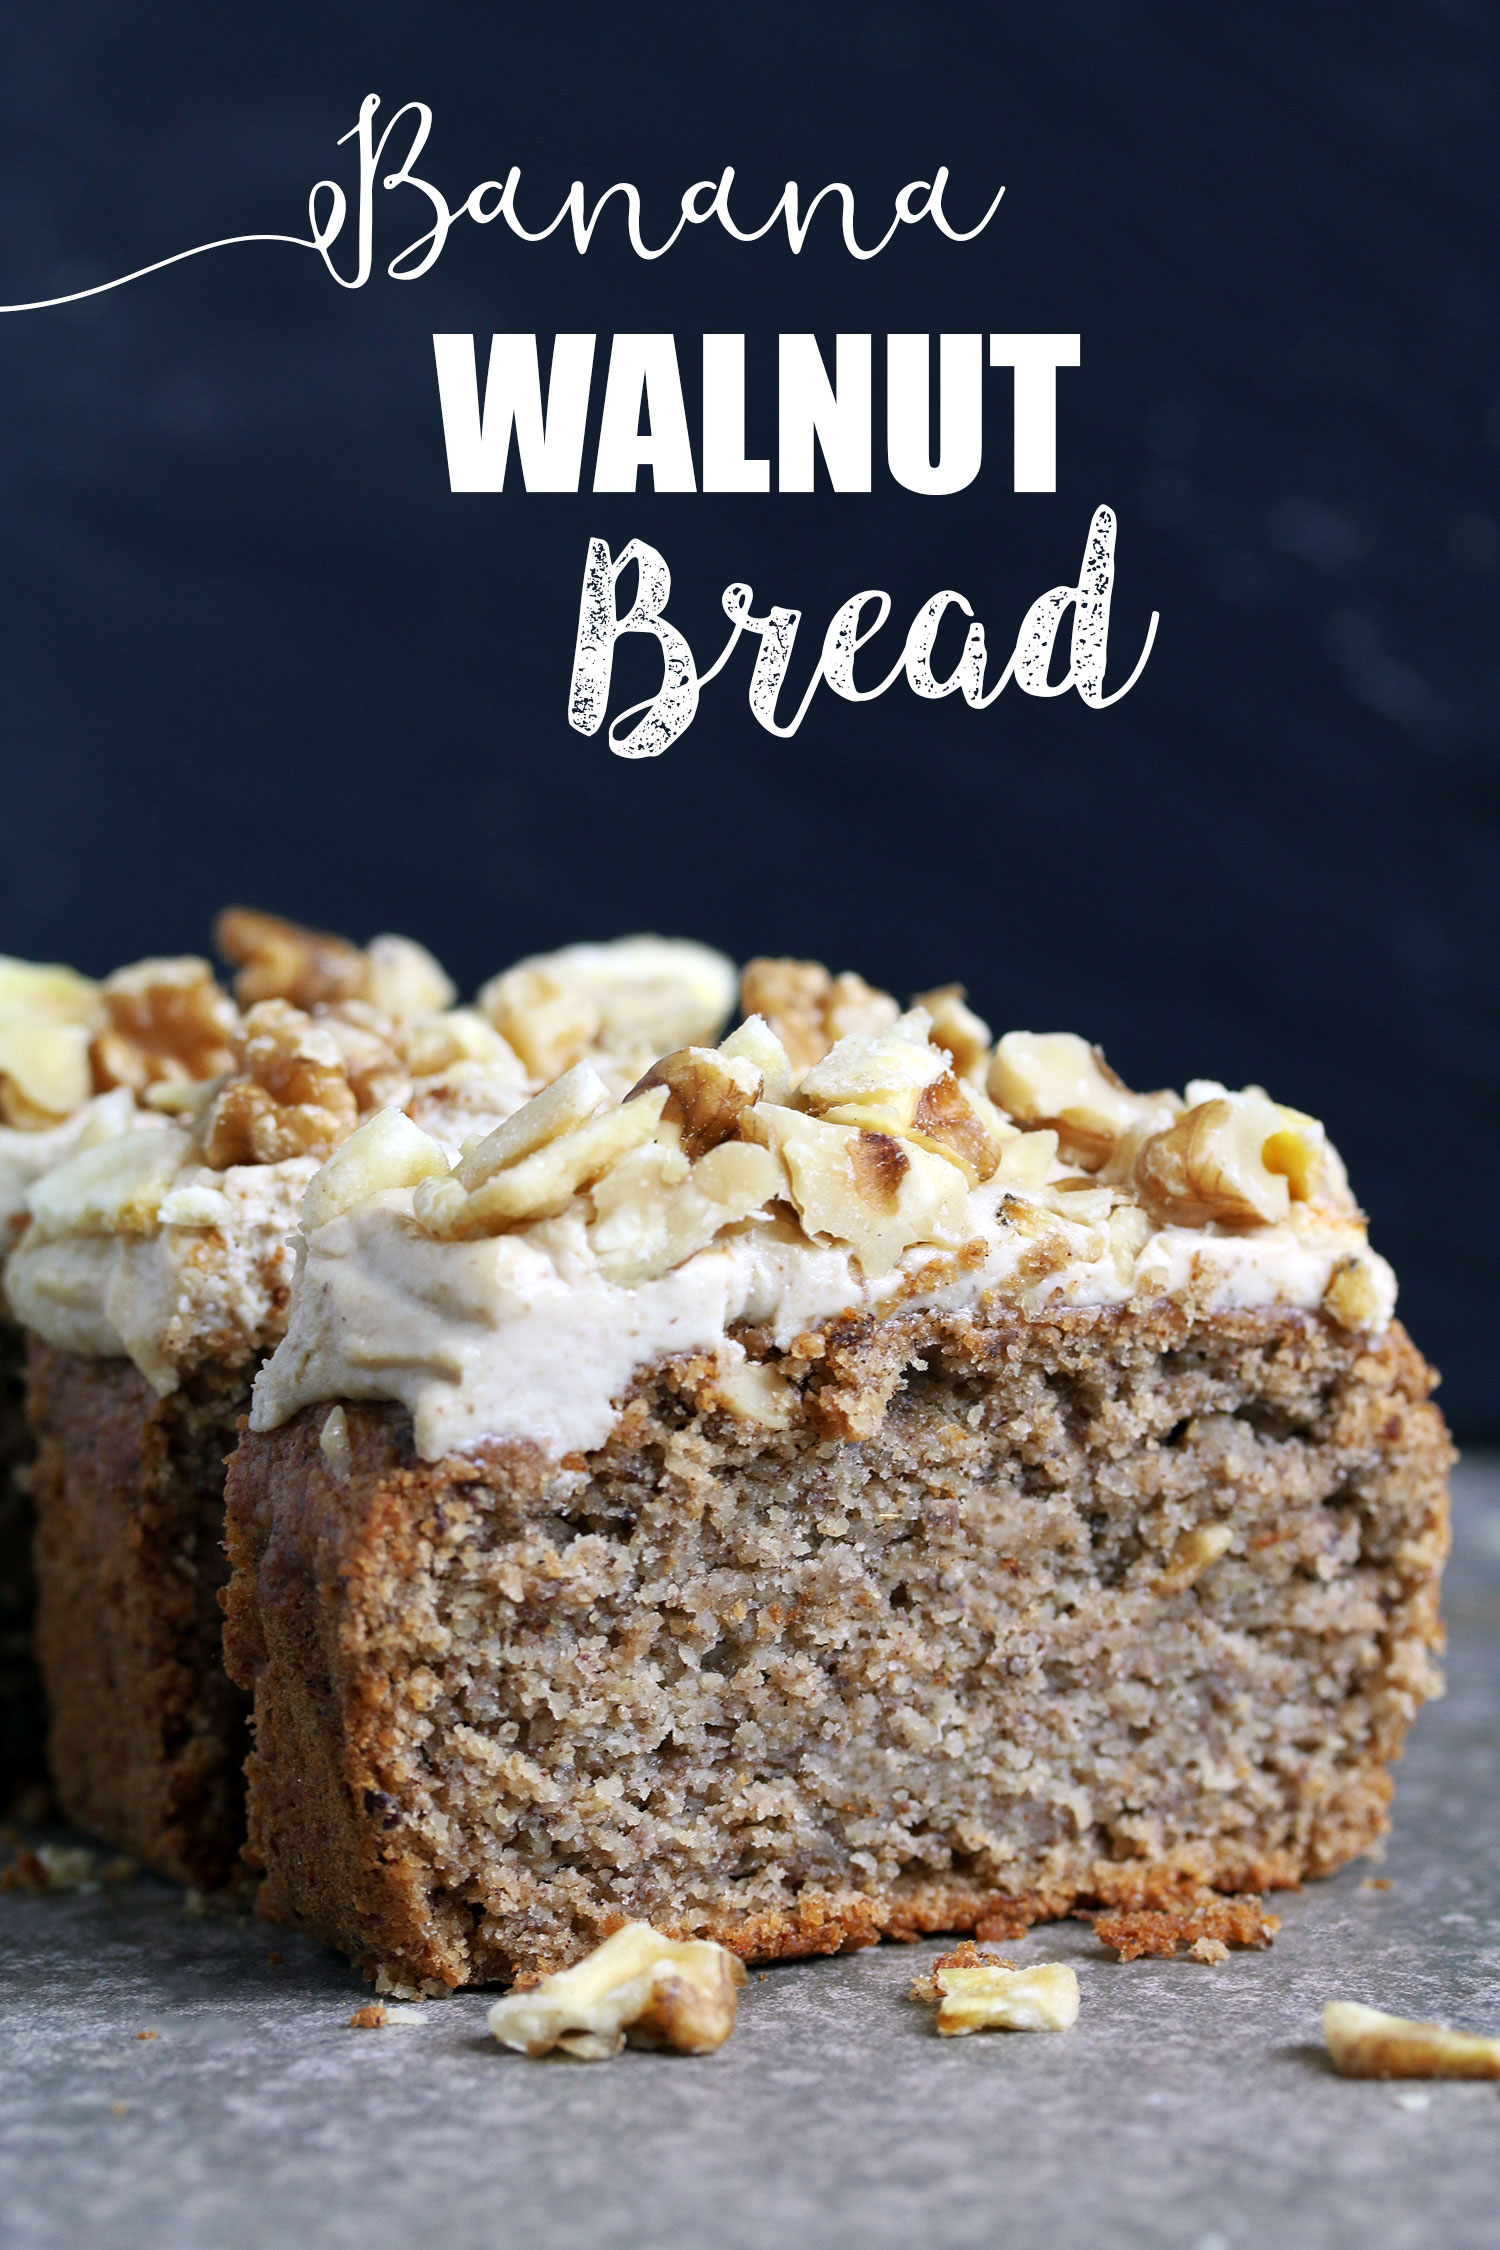 Banana Bread with Creamy Walnut Frosting - Vegan & Gluten-free